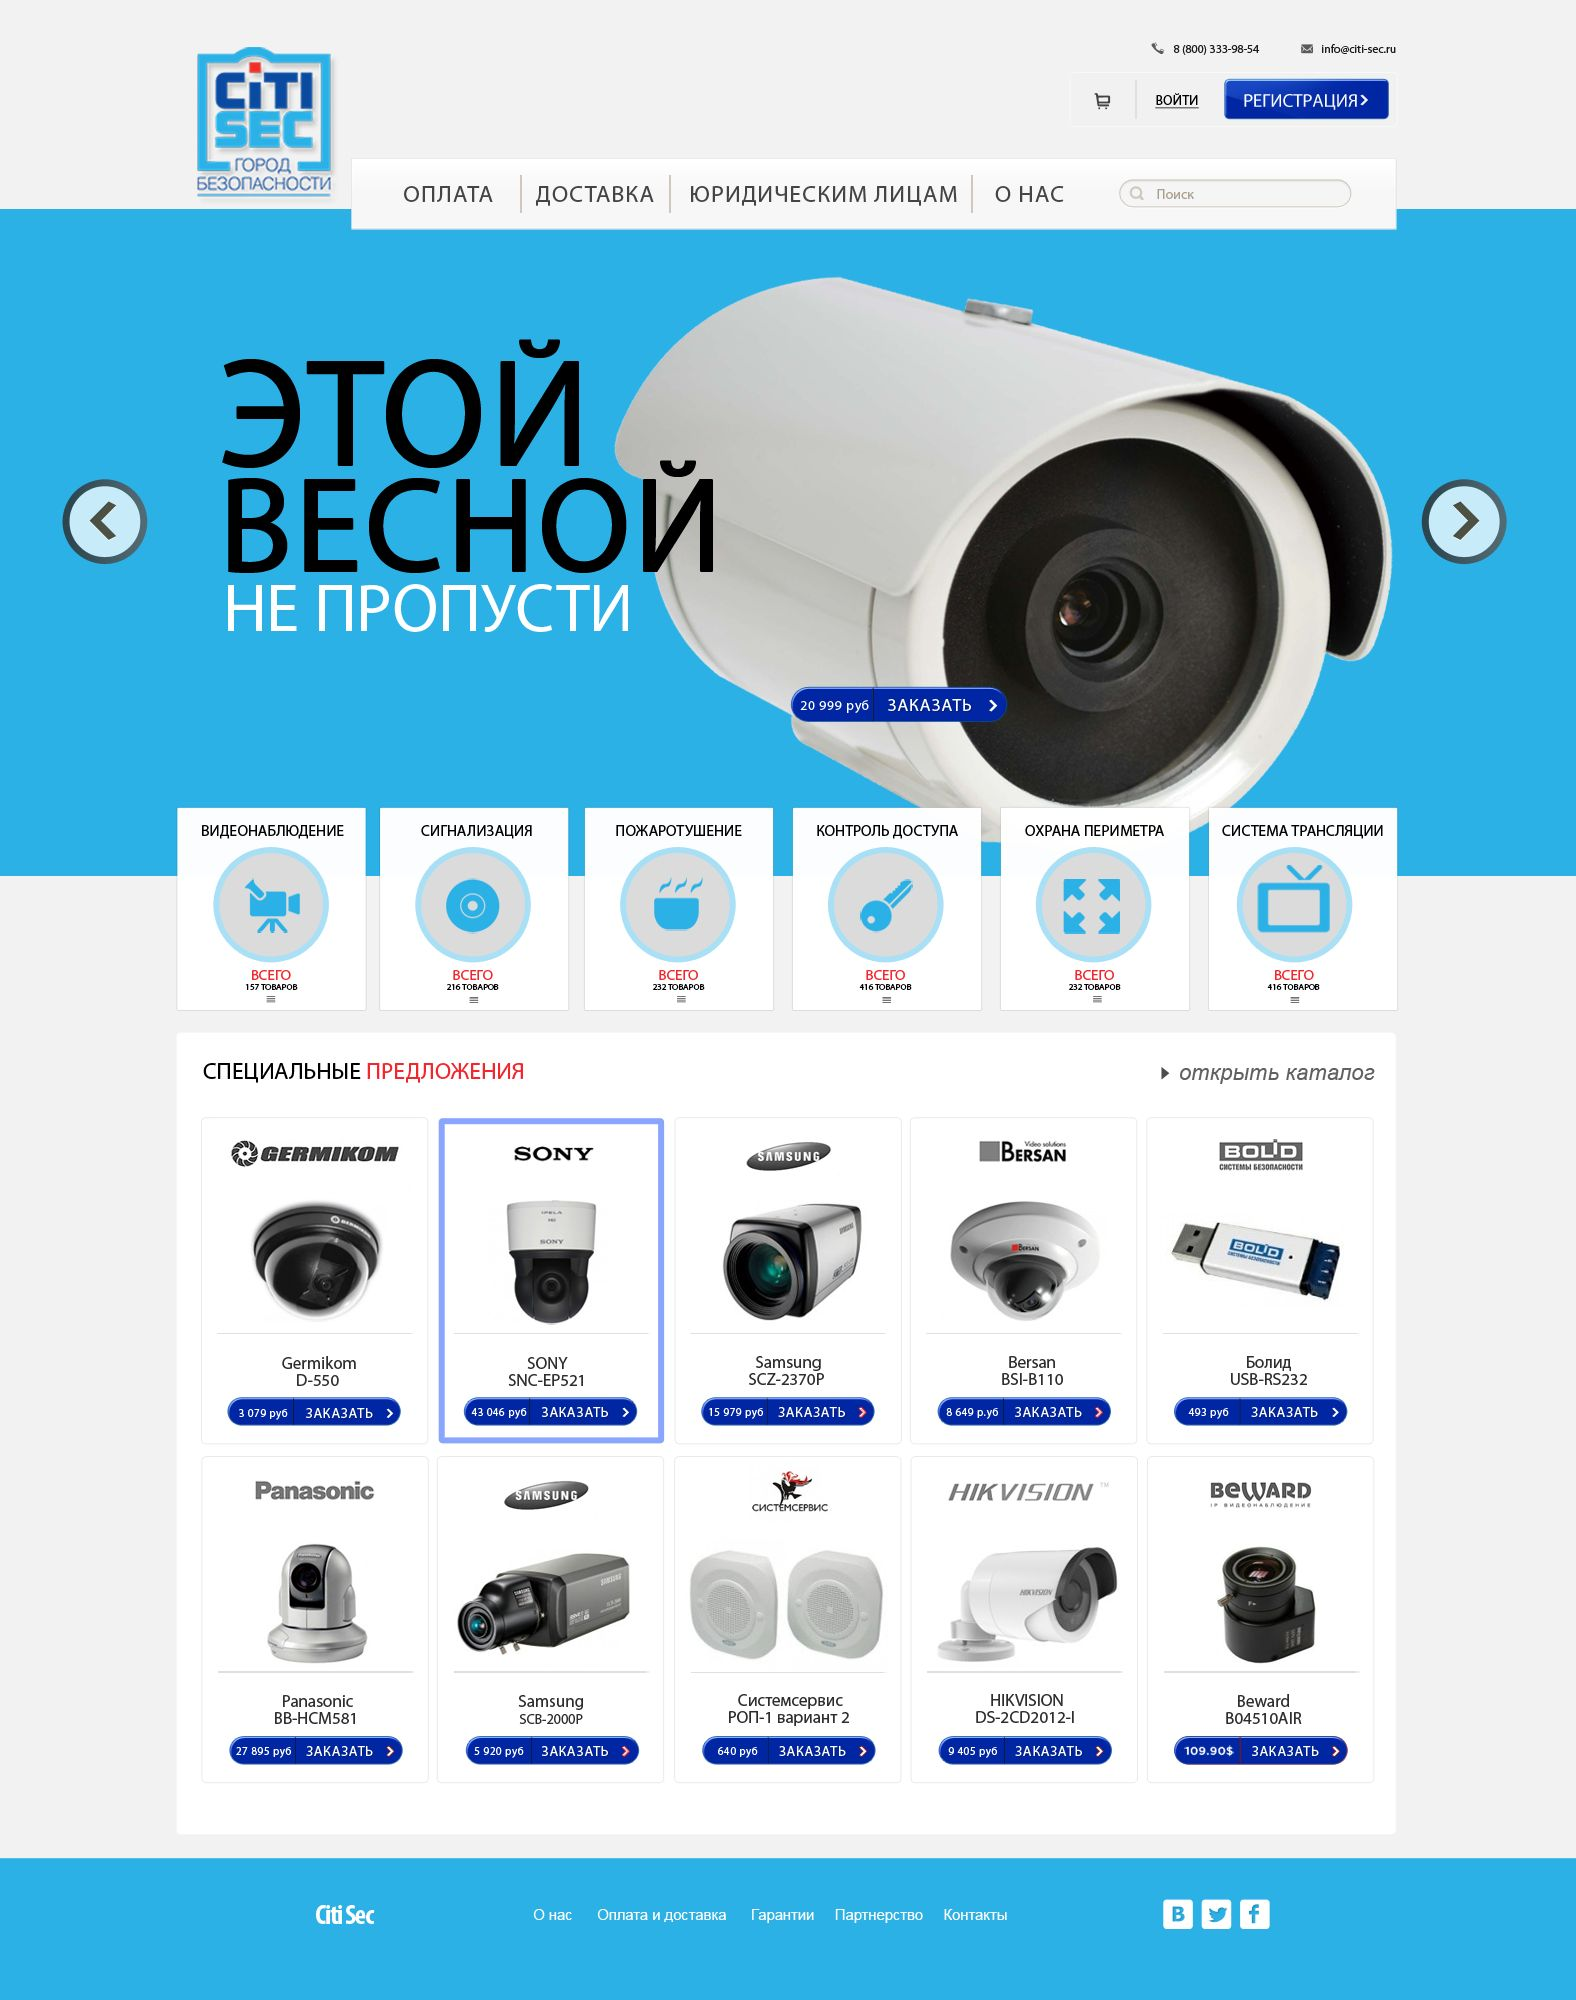 Дизайн интернет-магазина\сайта citi-sec.ru - дизайнер akira_cherry